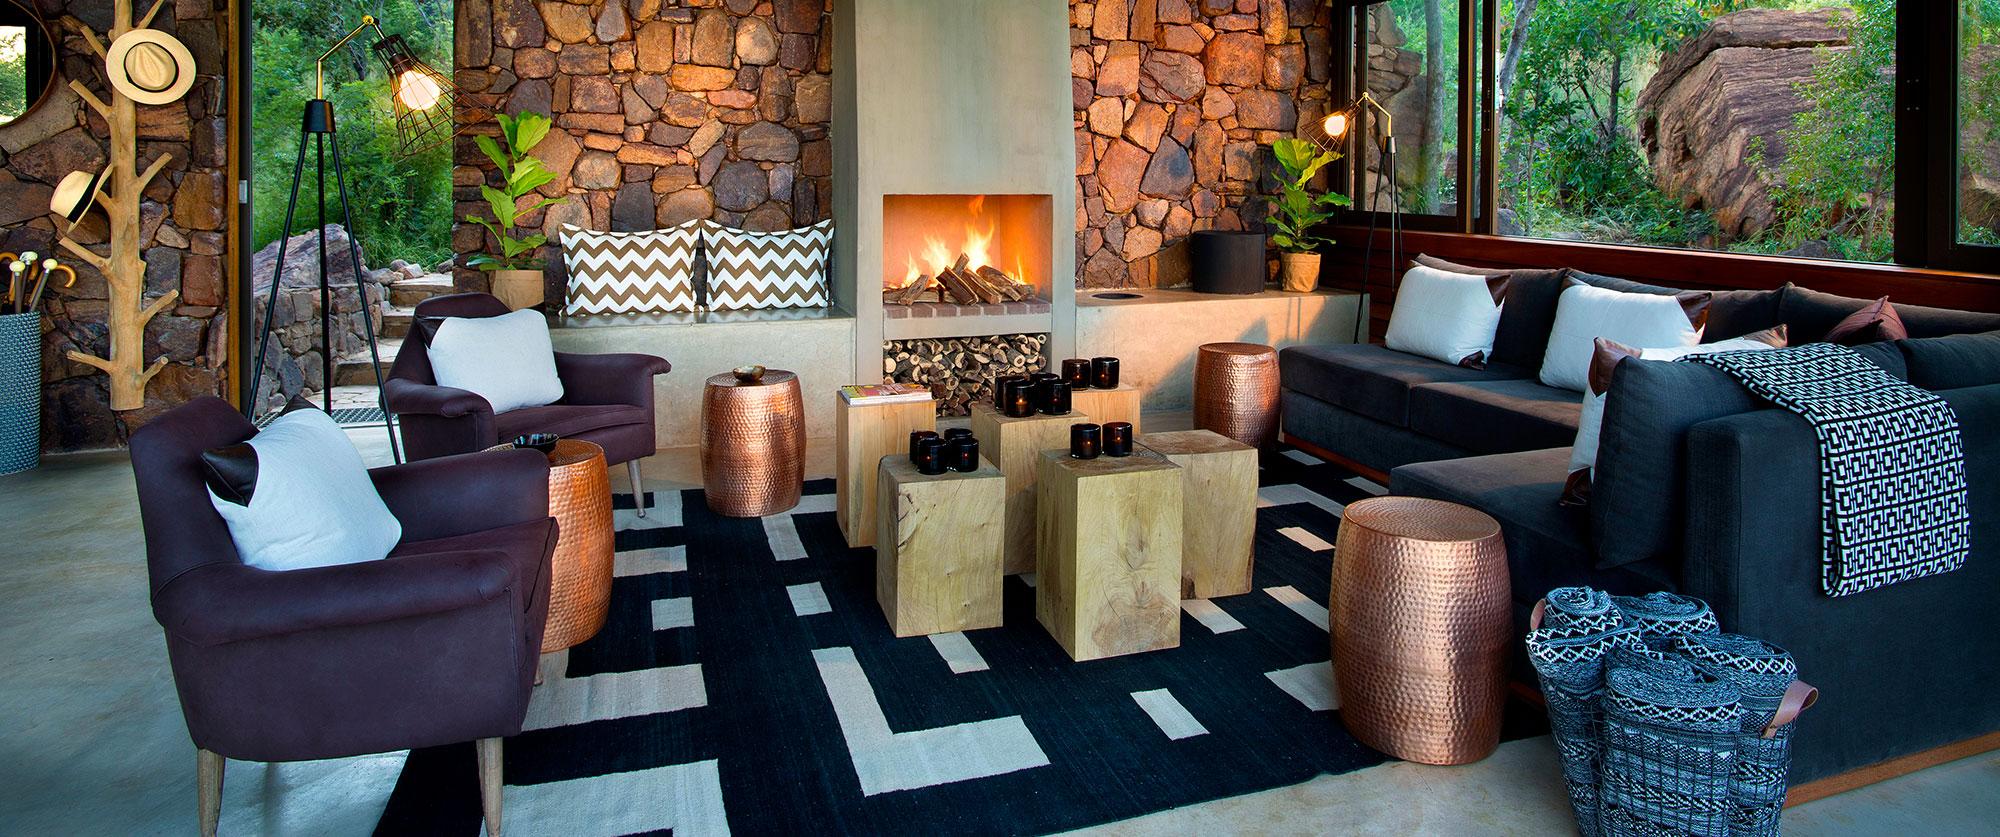 South Africa Luxury Tour - Marataba Trails